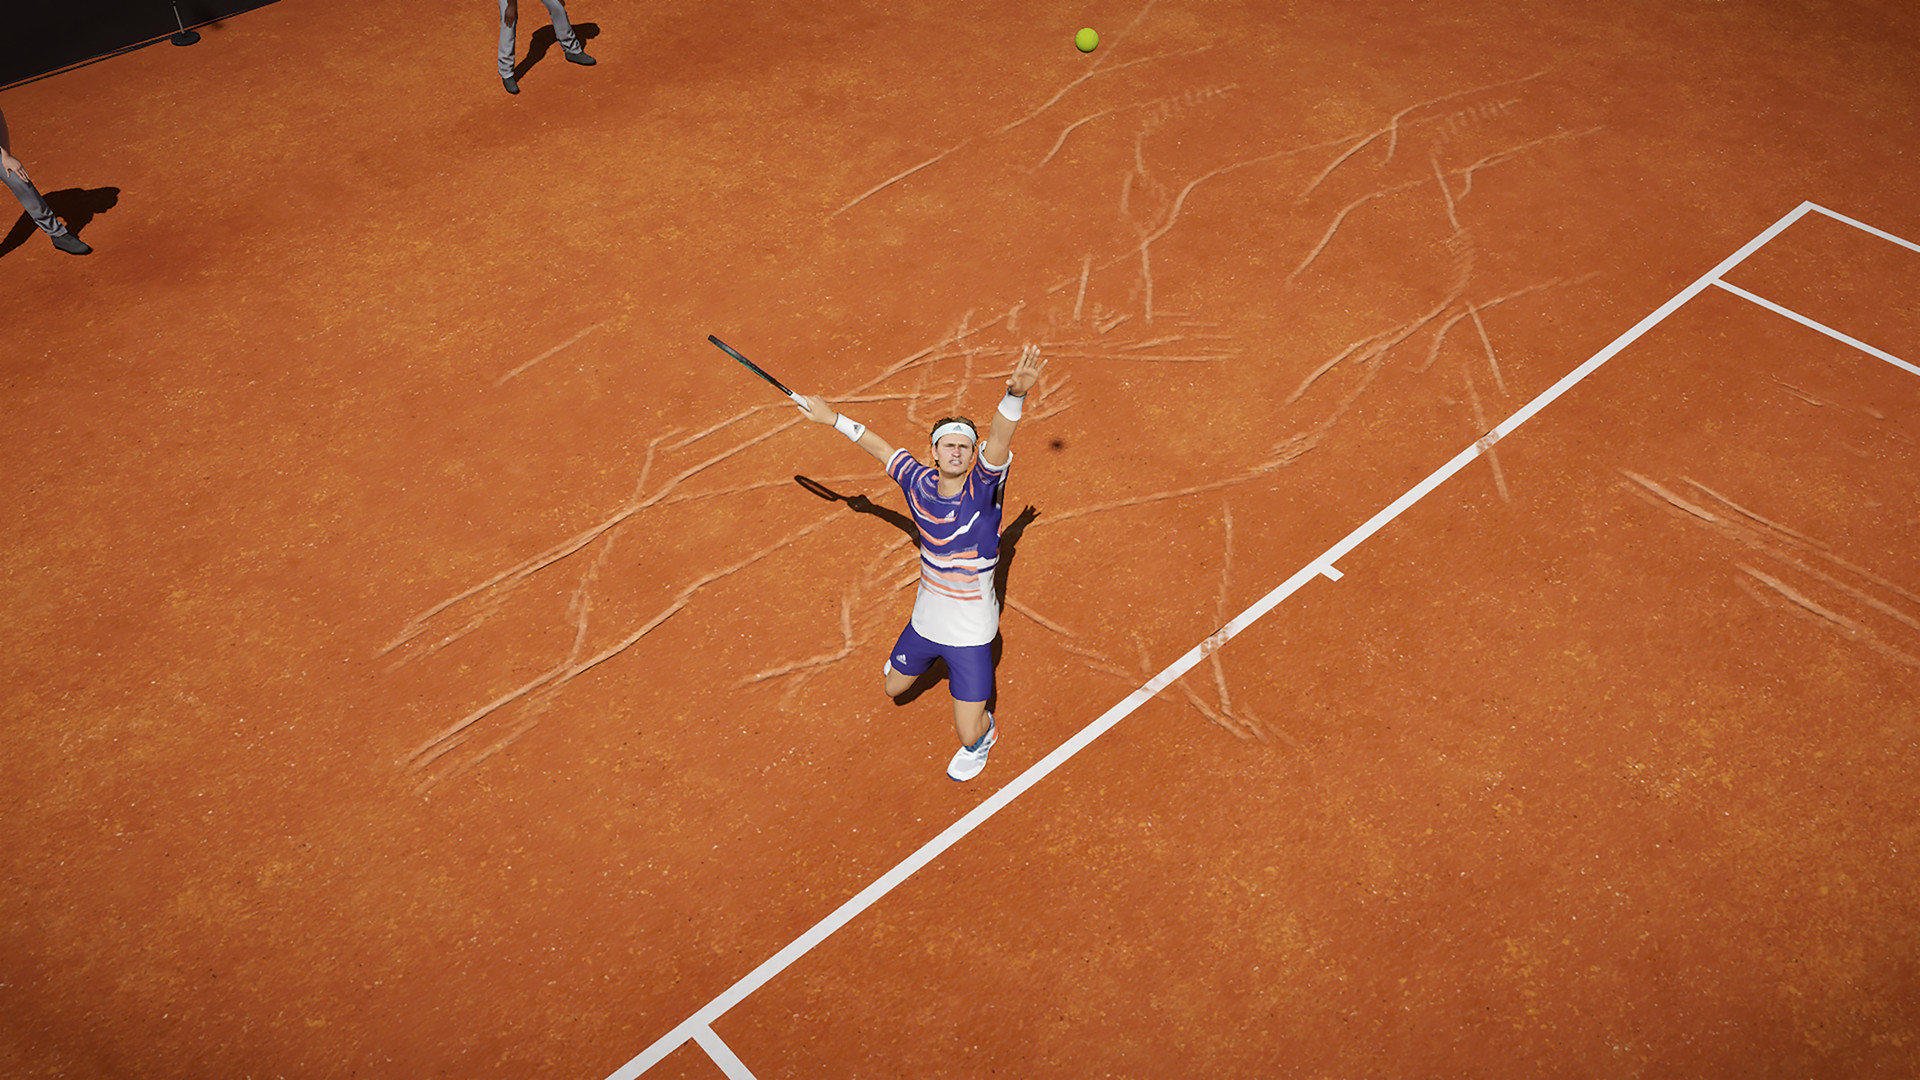 TENNIS WORLD TOURS 2 IMAGE